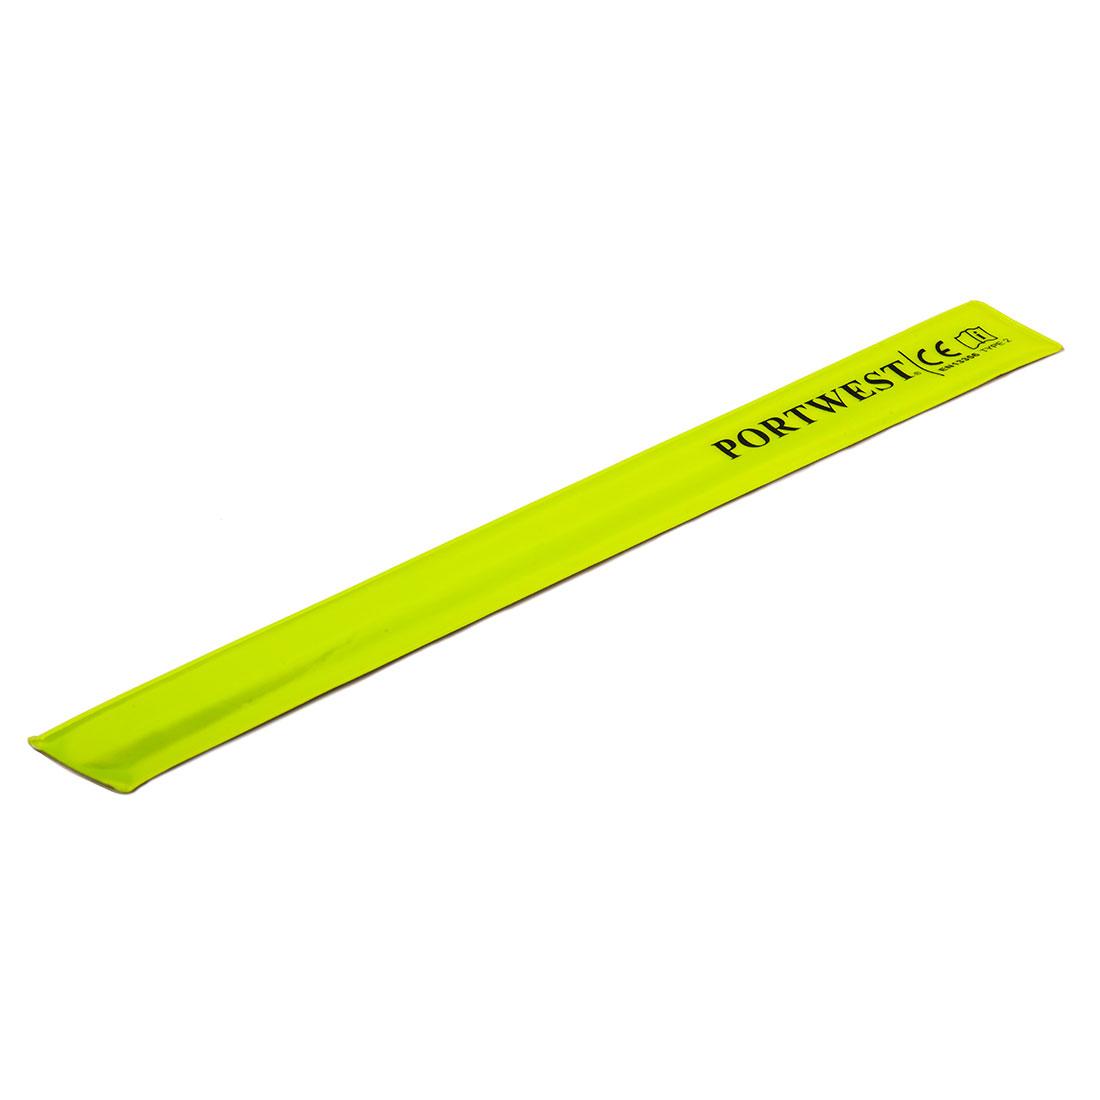 Portwest Reflective Slap Wrap Band 41 x 4cm - HV04